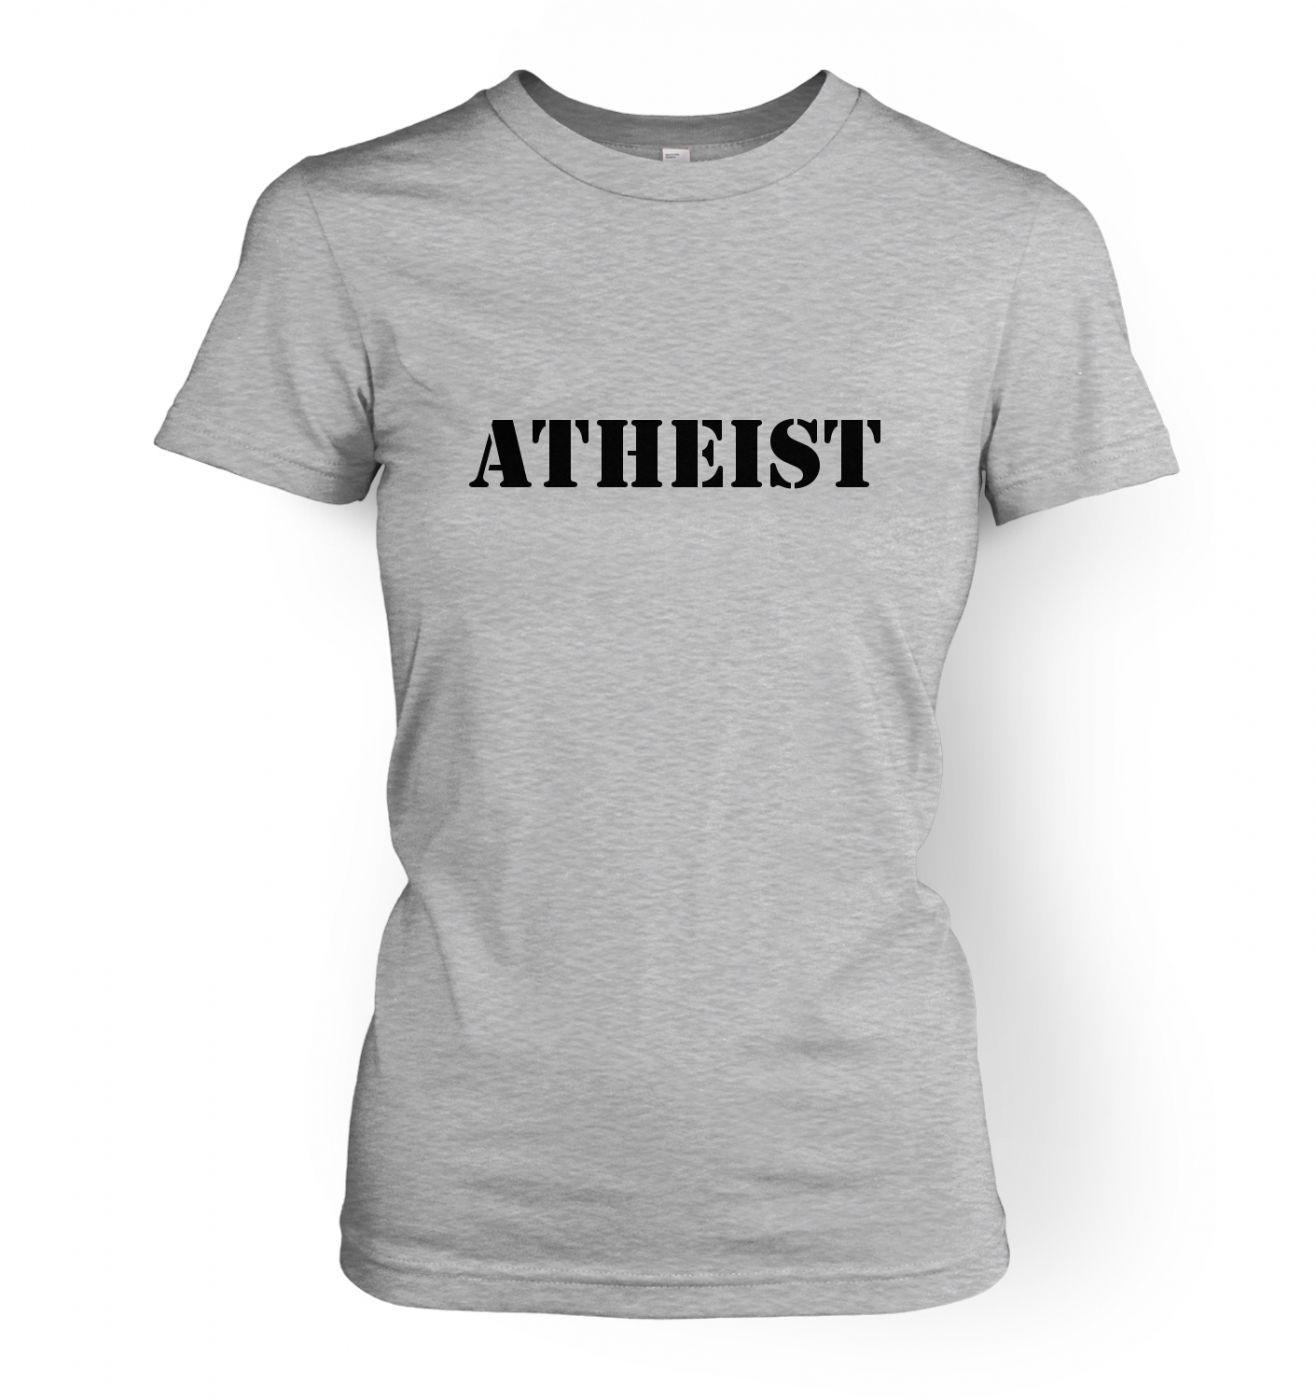 ATHEIST women's tshirt